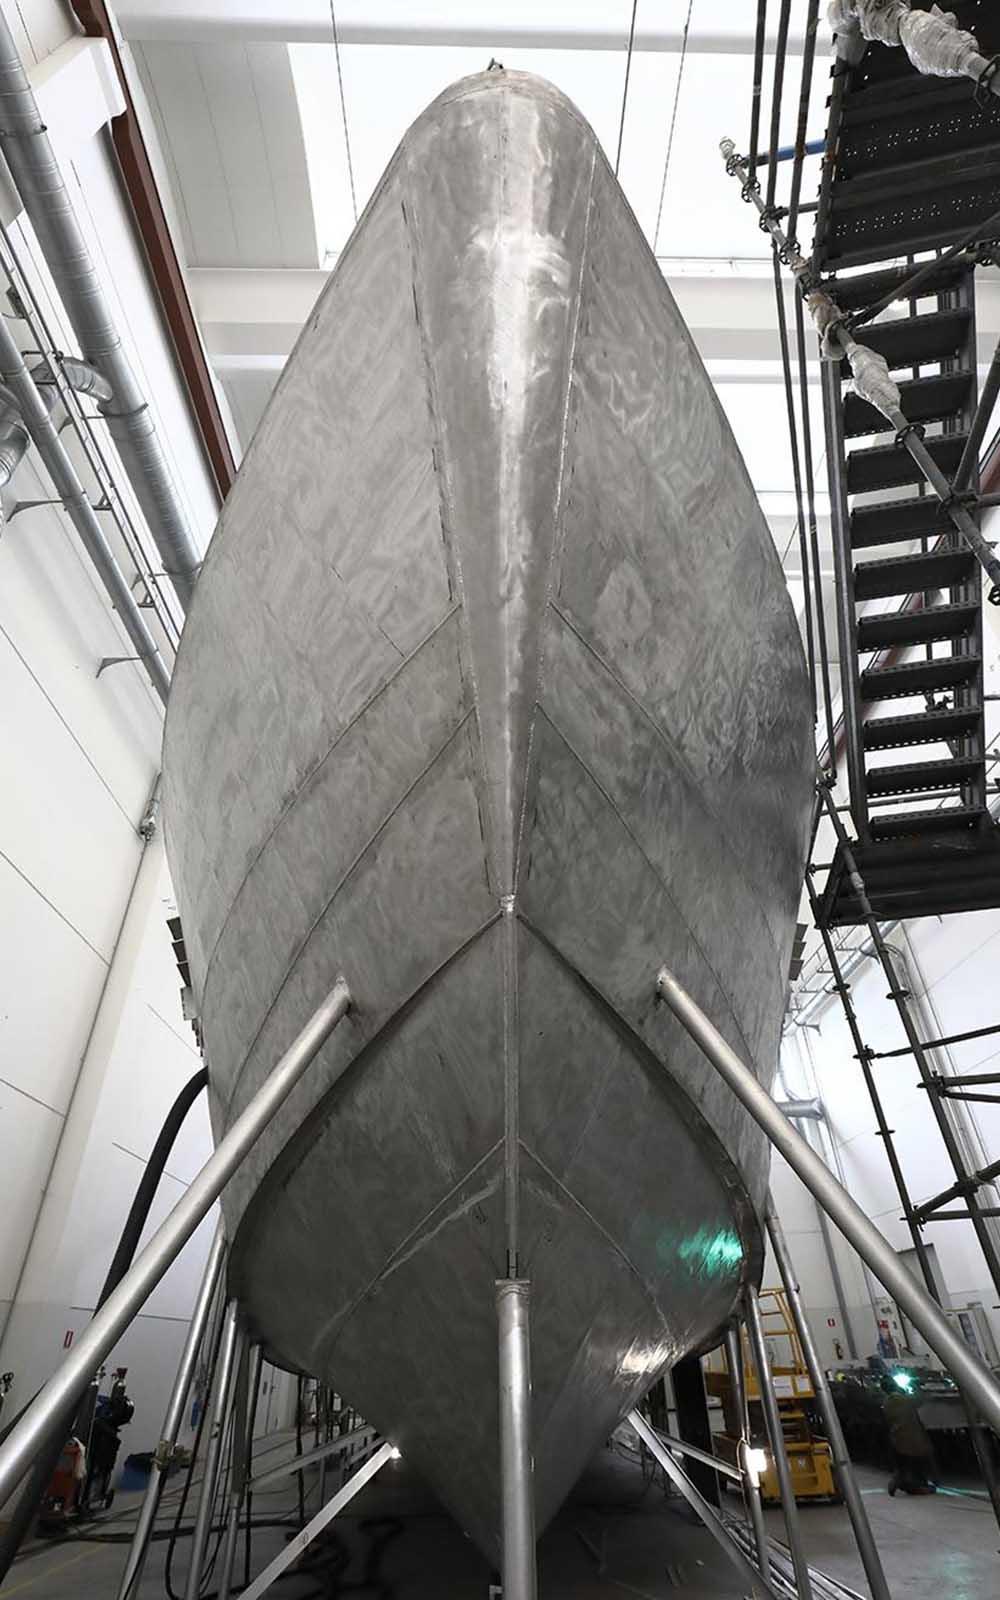 Eco-Tender-de-25m-toma-forma-na-Perini-Navi-boatshopping